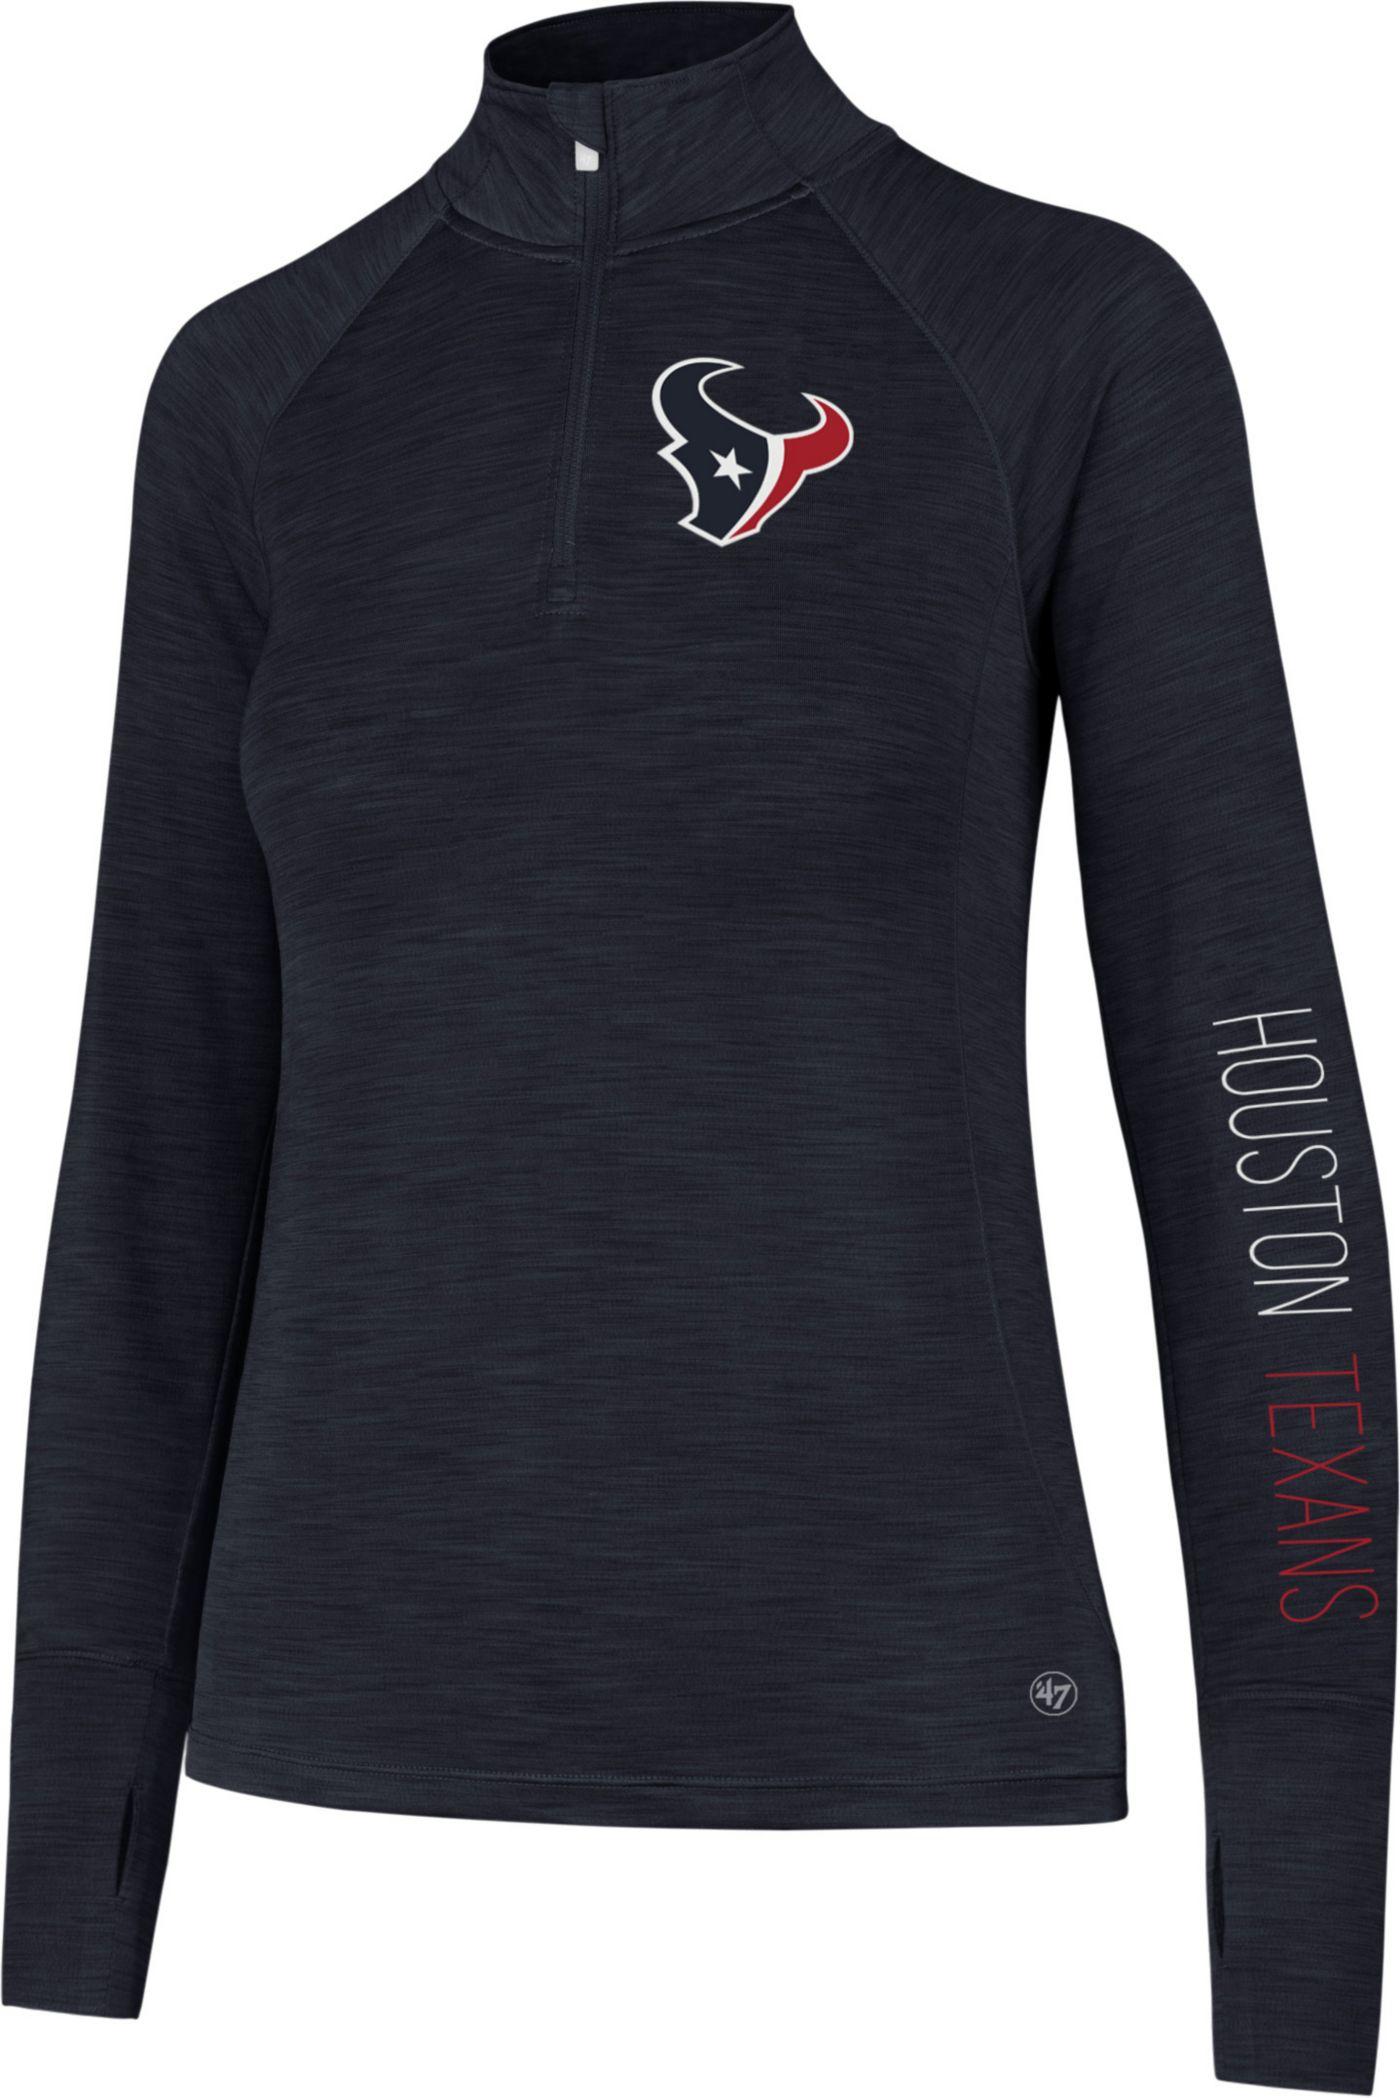 '47 Women's Houston Texans Shade Navy Quarter-Zip Pullover